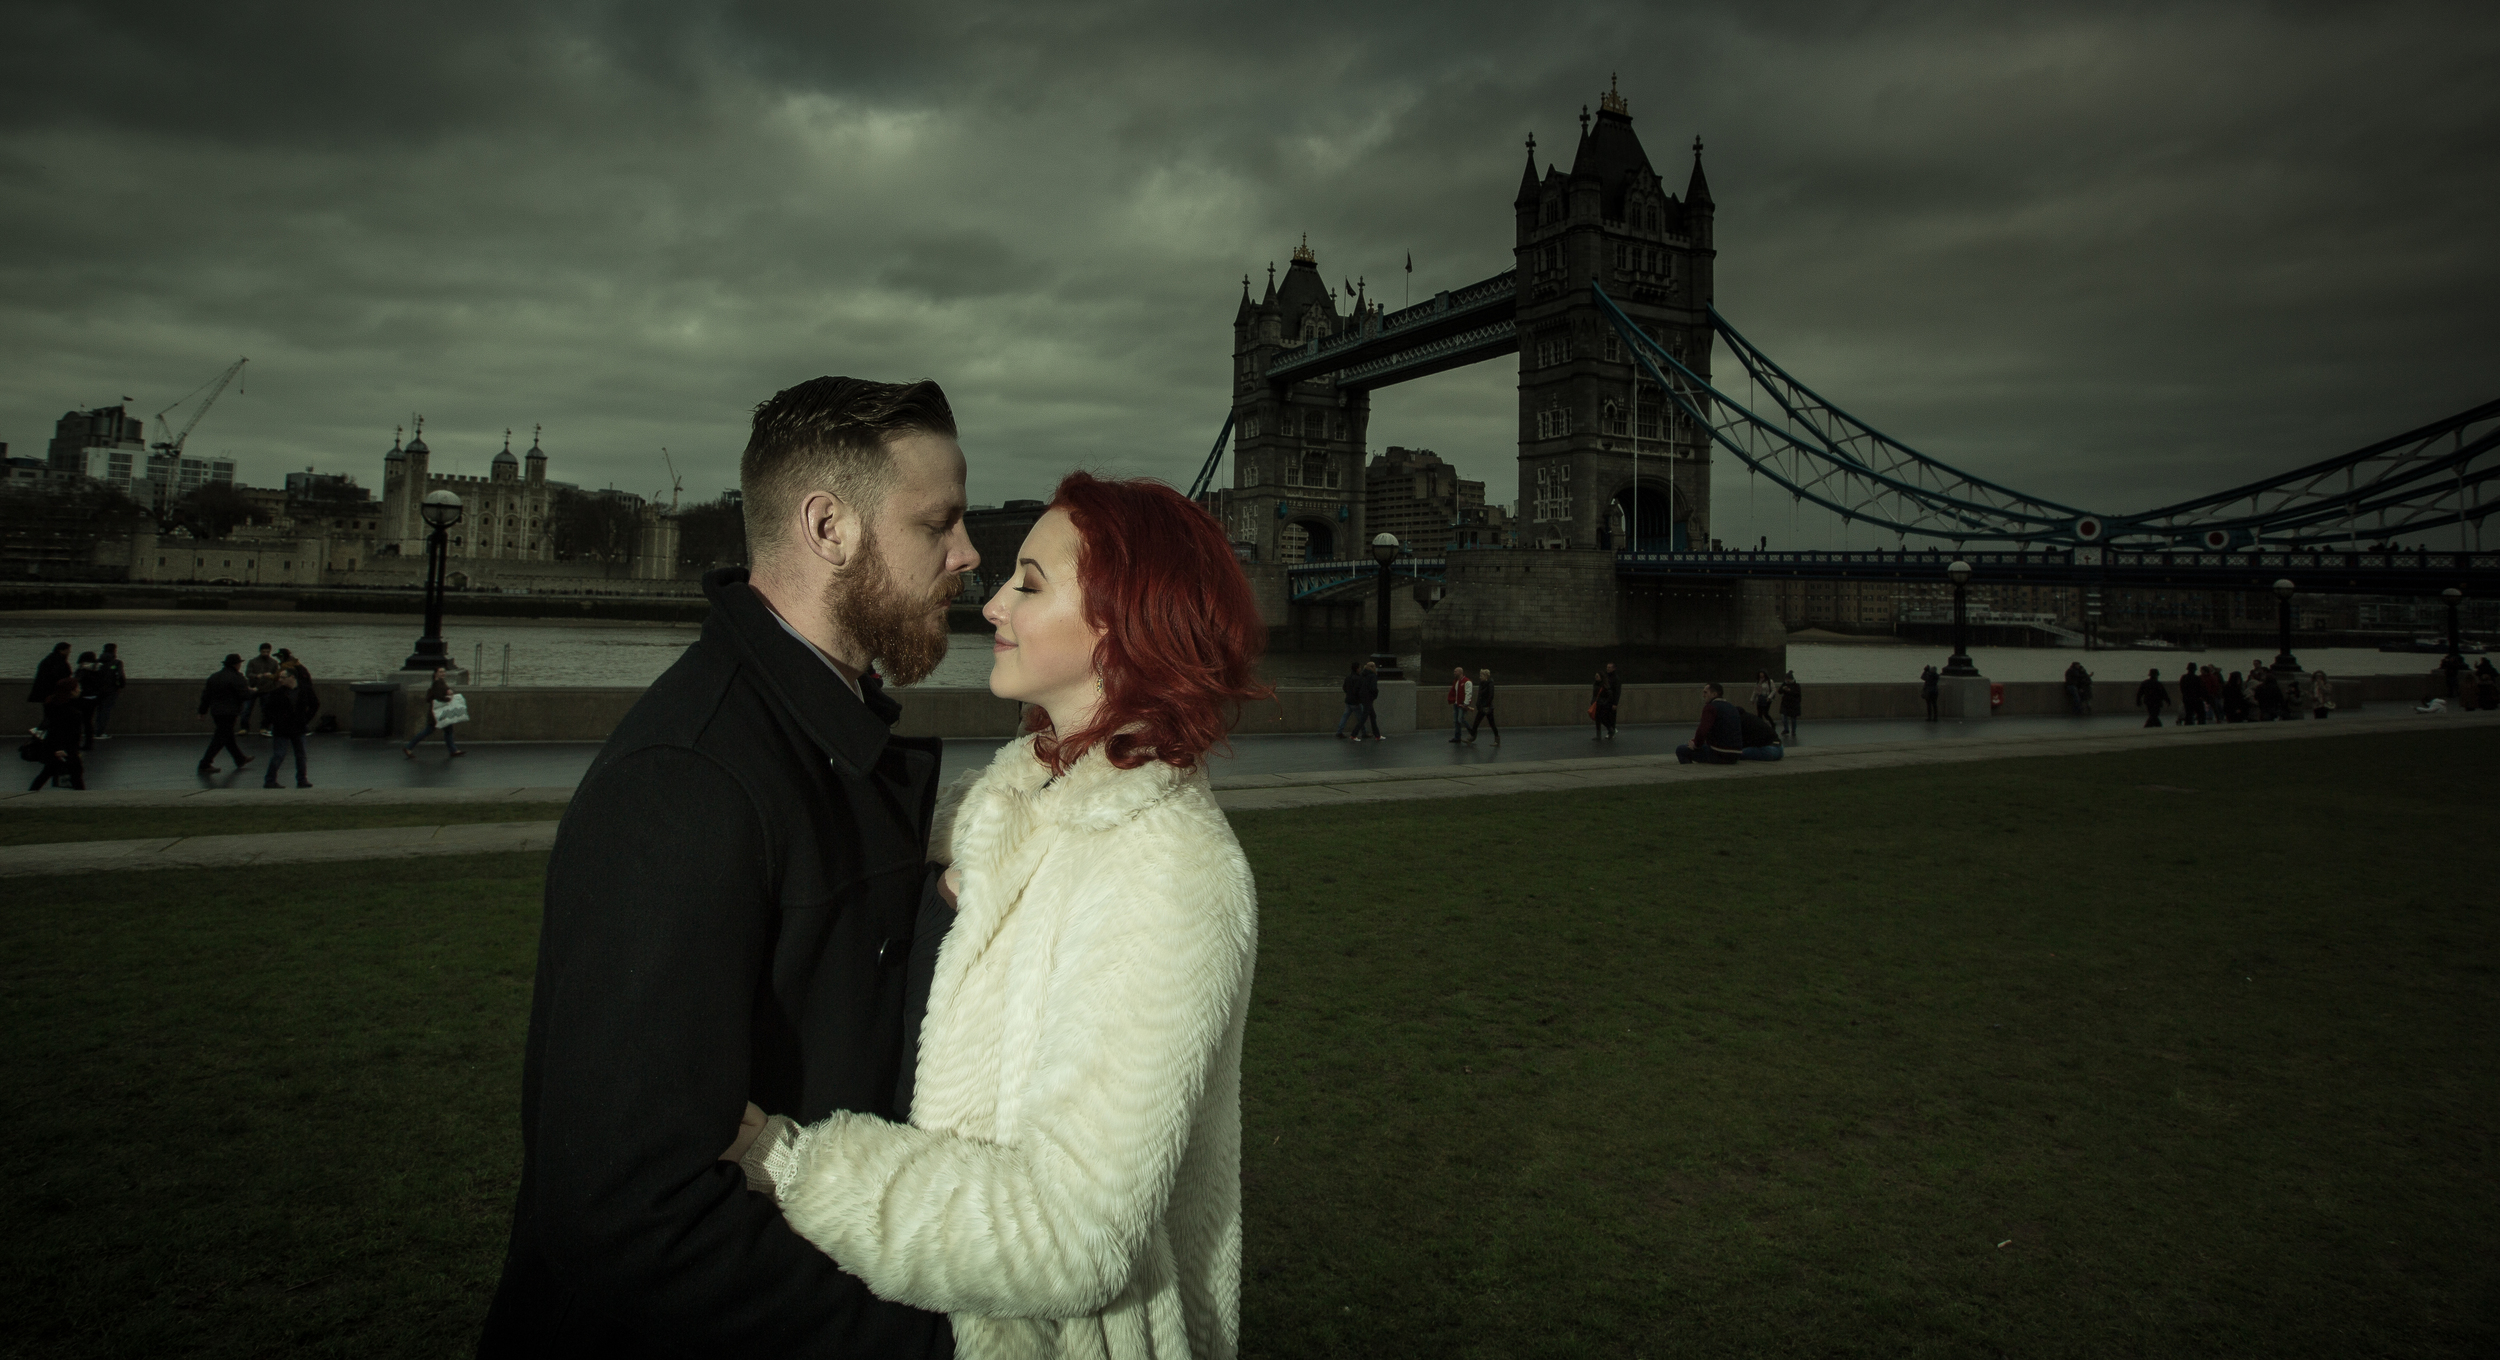 westminster-engagement-3-london-uk-destination-wedding-photography-Adam-Rowley